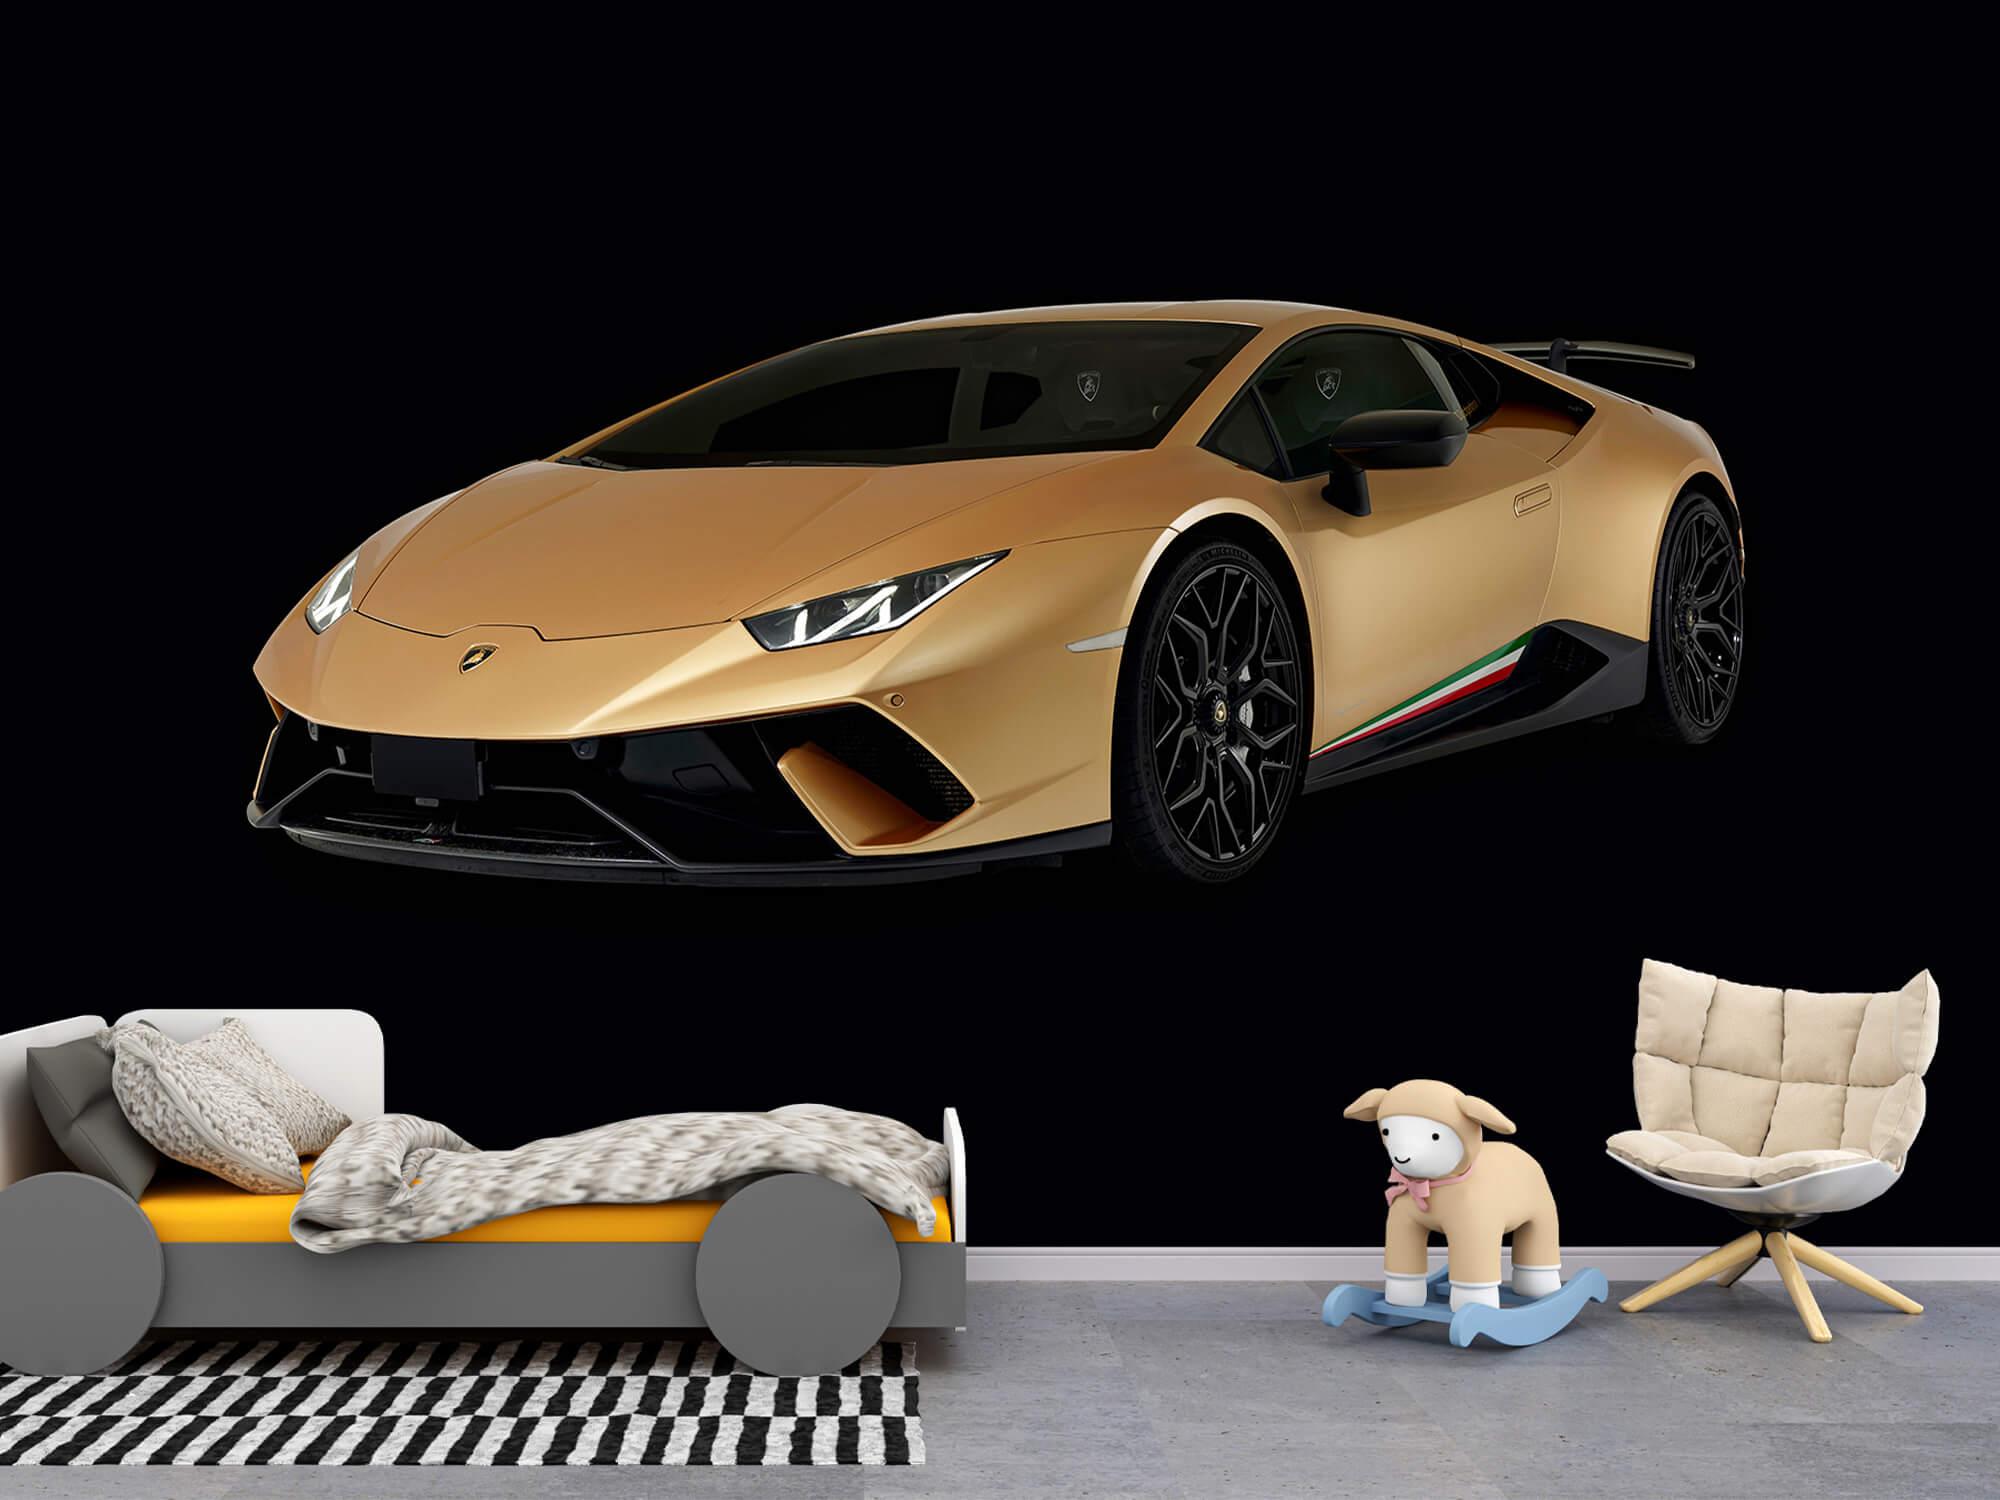 Wallpaper Lamborghini Huracán - Rechter voorkant, zwart 9